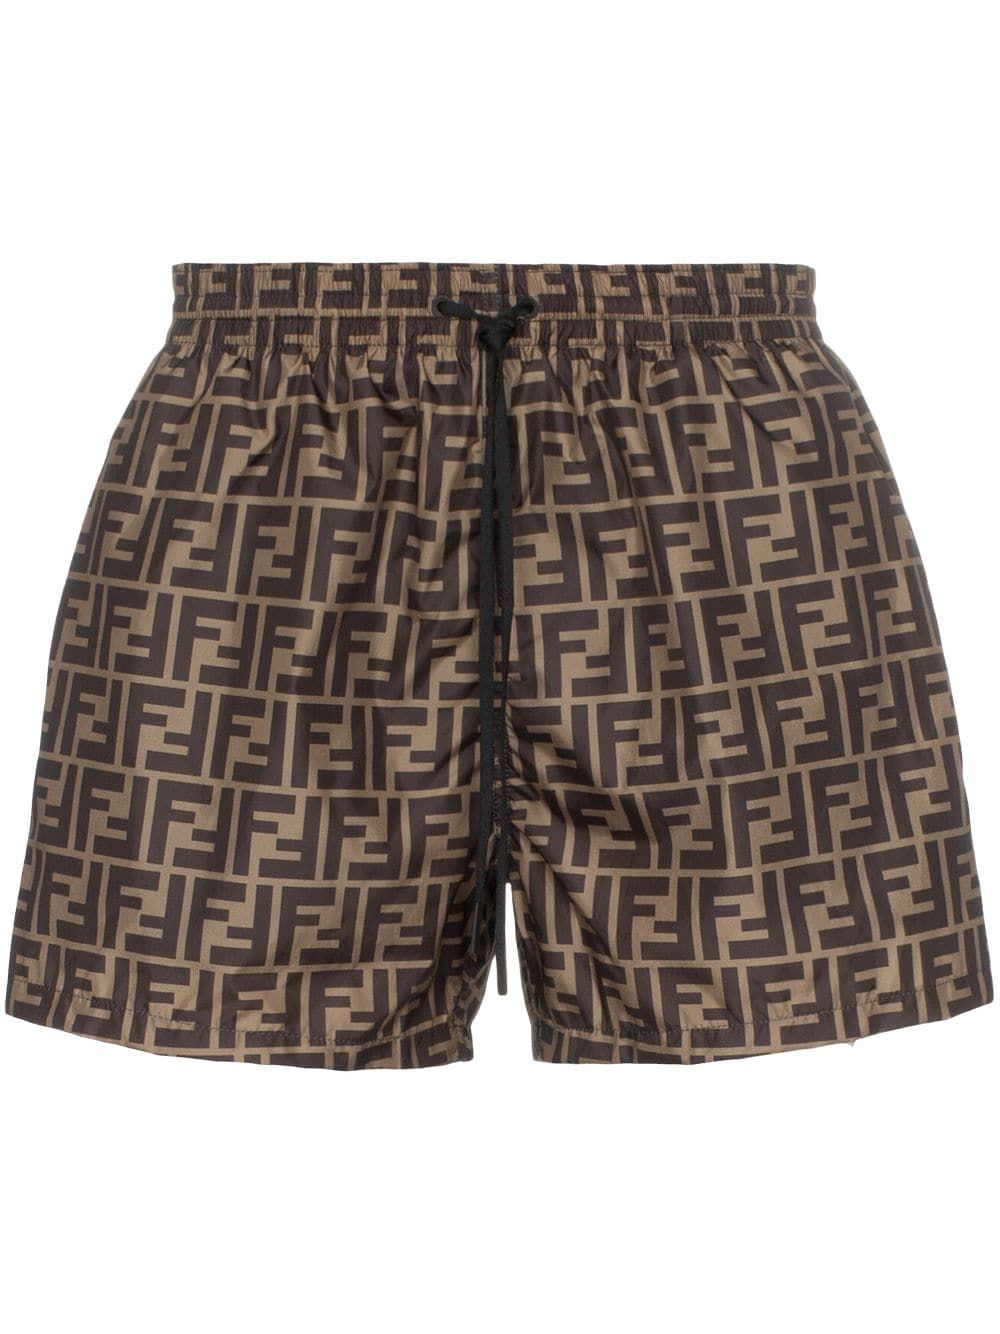 154053b1b4 FENDI FENDI FF LOGO PRINT SWIM SHORTS - BROWN. #fendi #cloth | Fendi ...